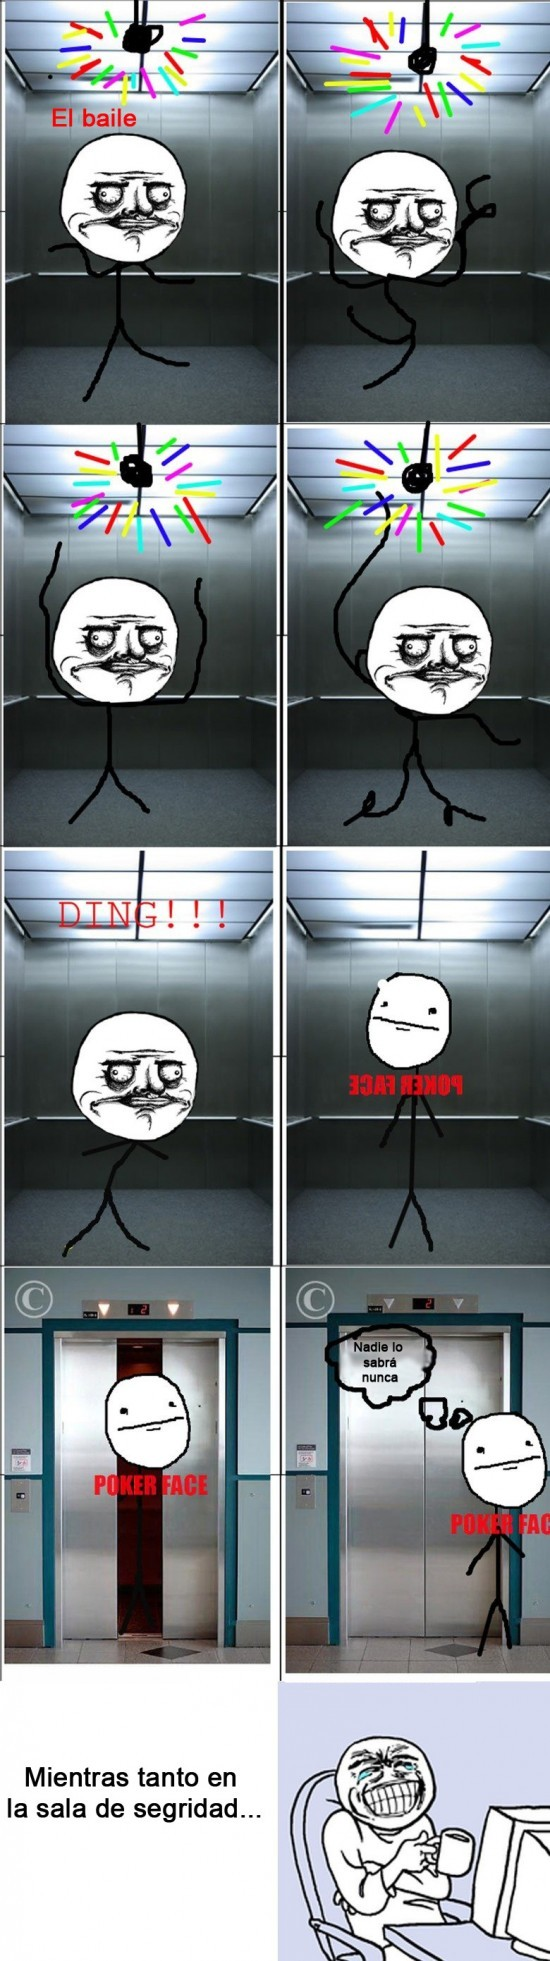 Bailes en secreto - meme